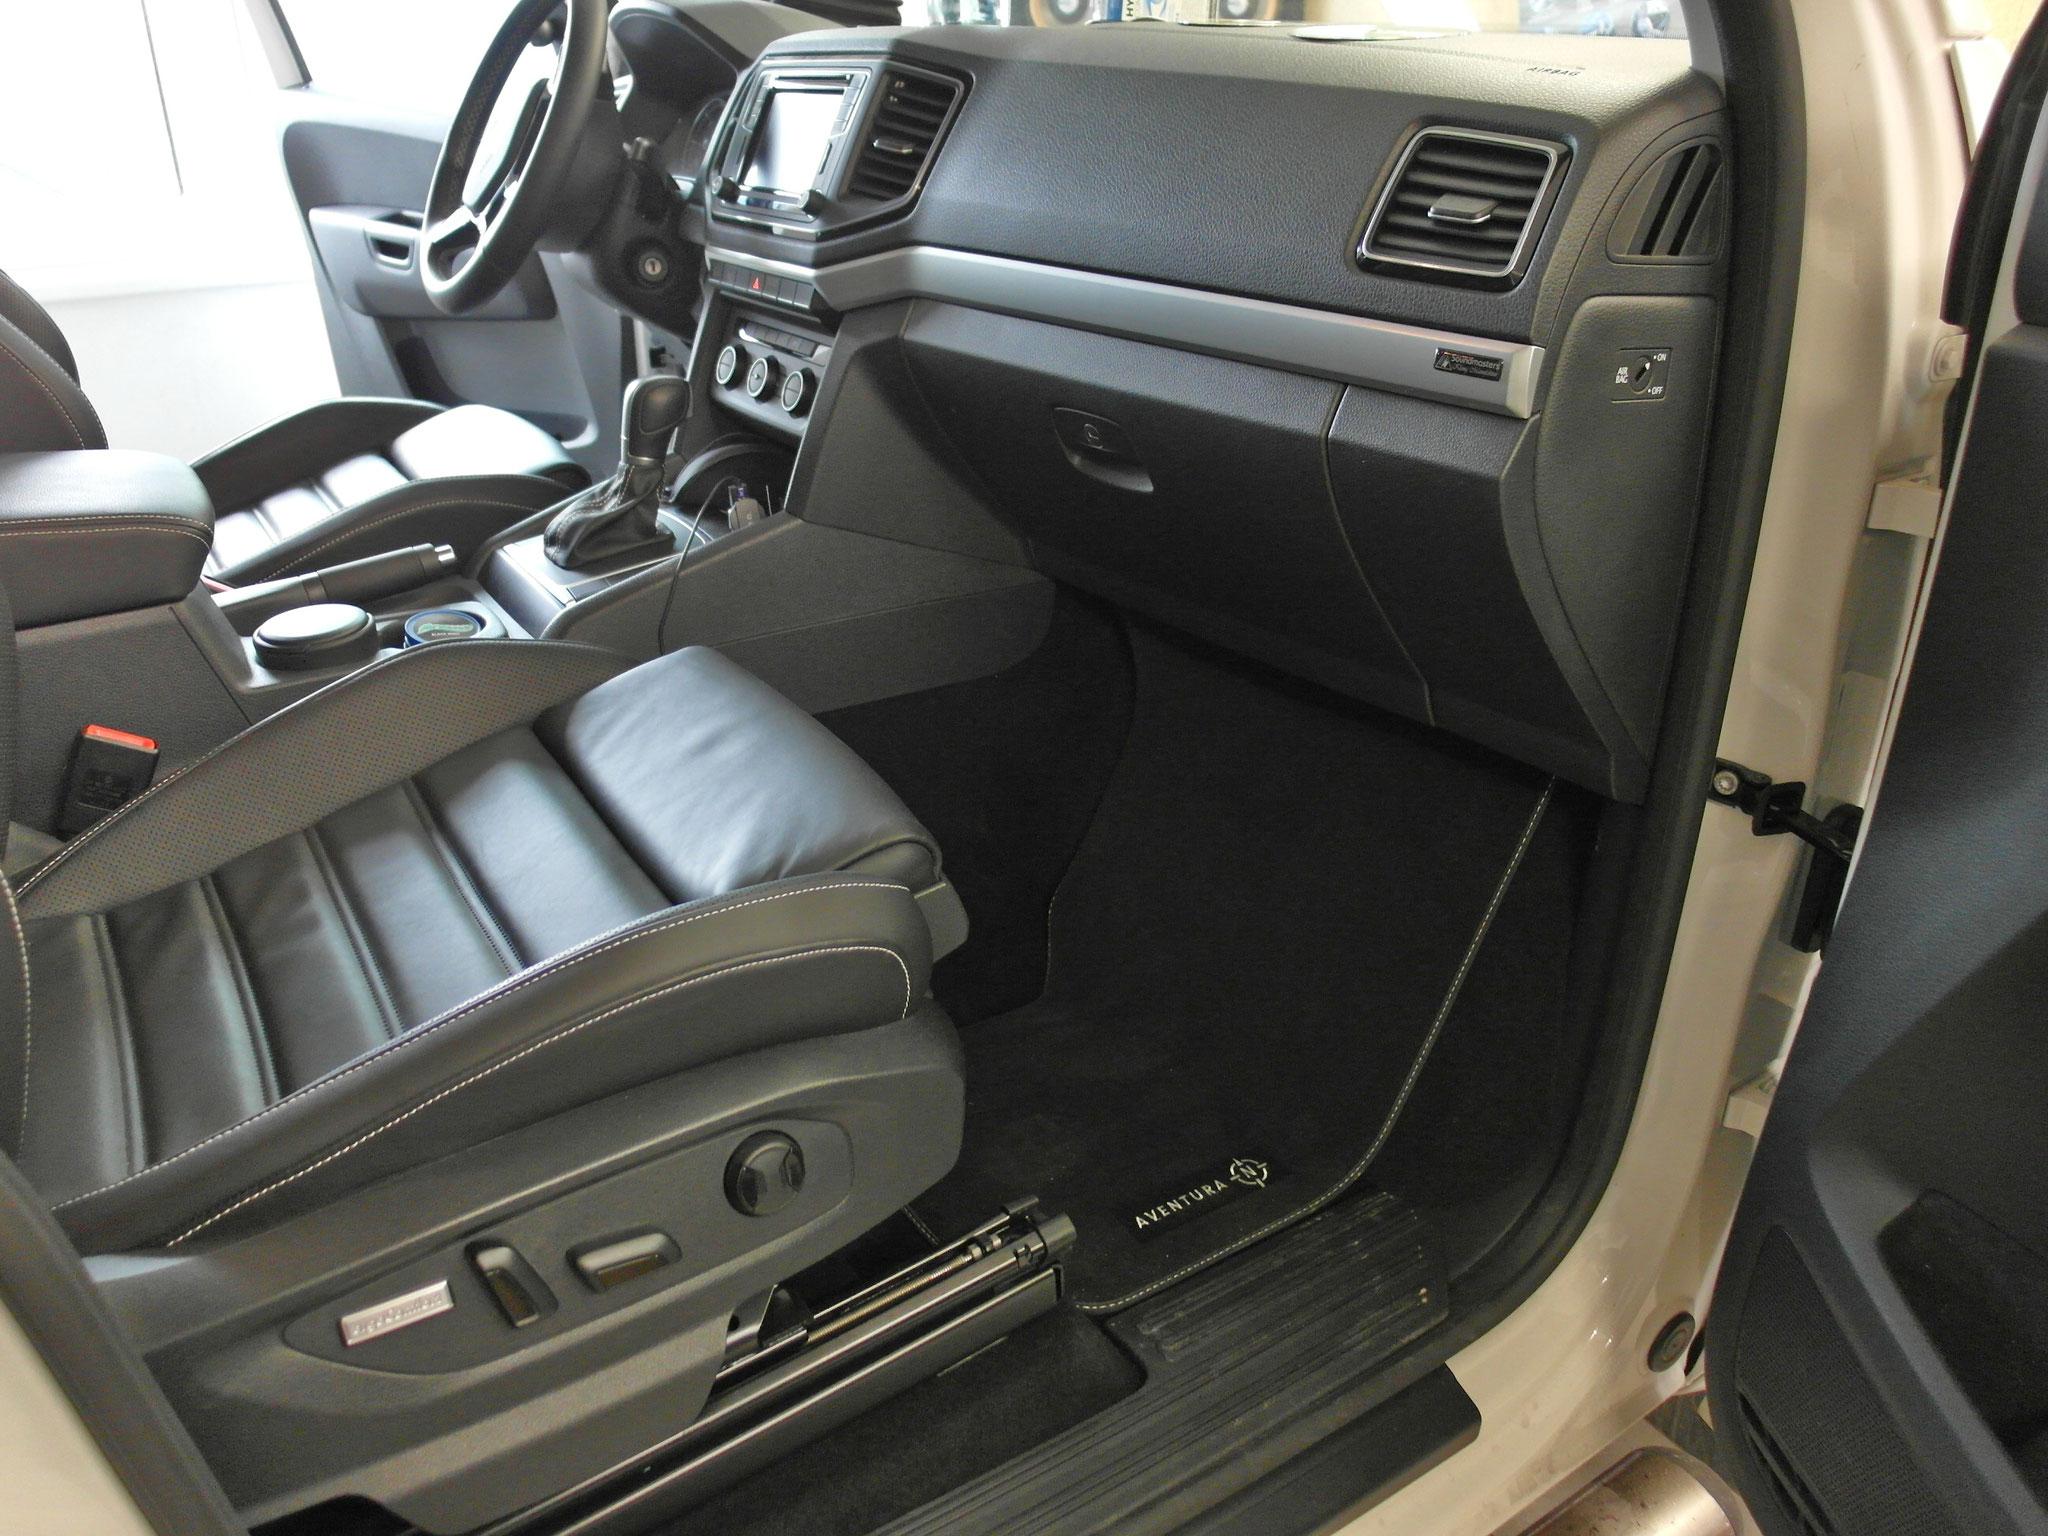 VW Amarok - 25er im Beifahrerfußraum